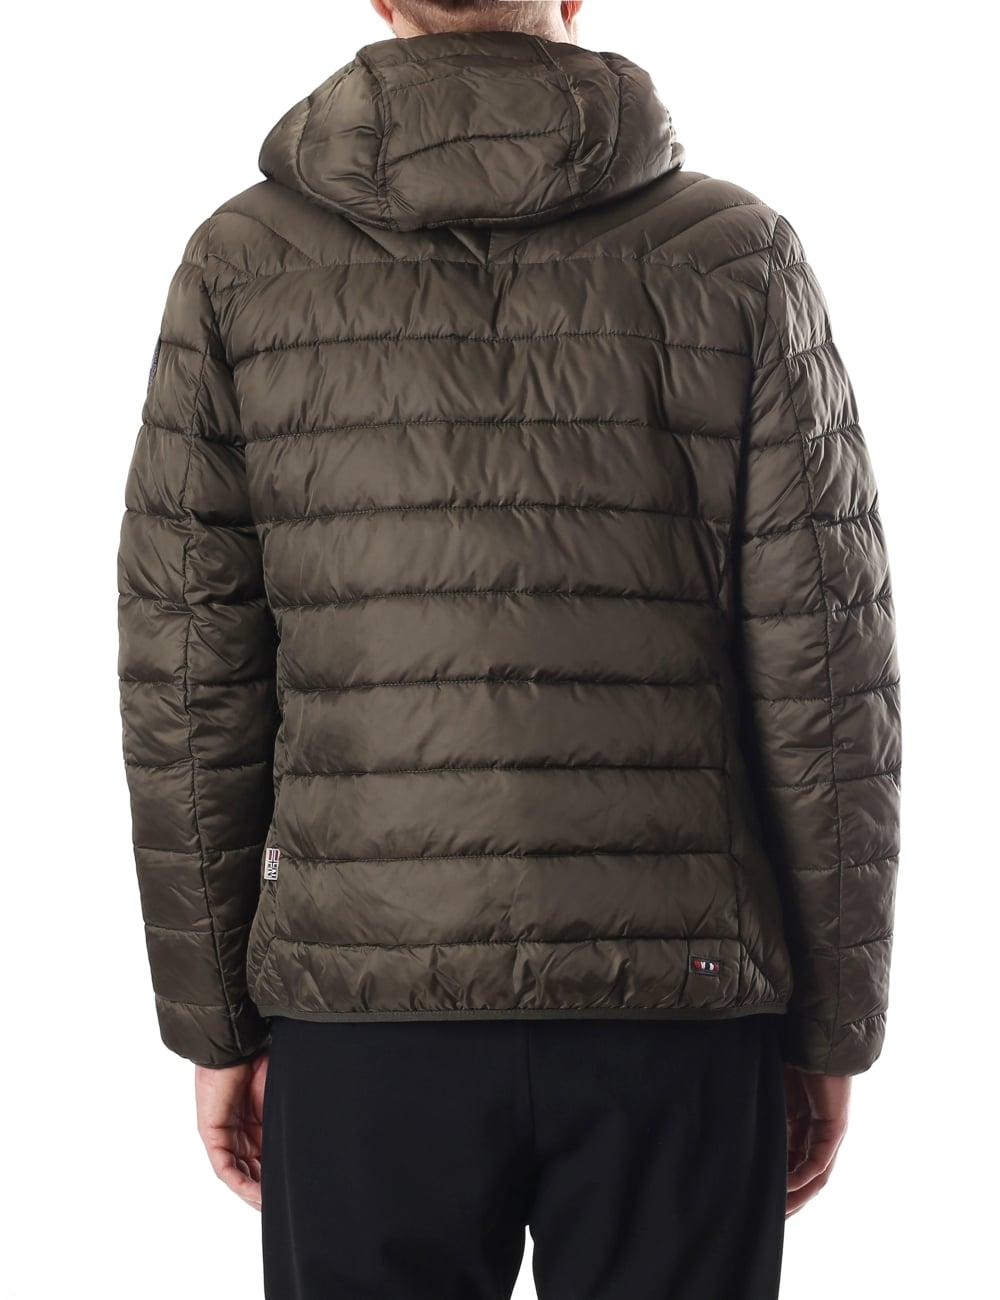 Napapijri Aerons Men's Quilted Hooded Jacket : mens quilted hooded jacket - Adamdwight.com